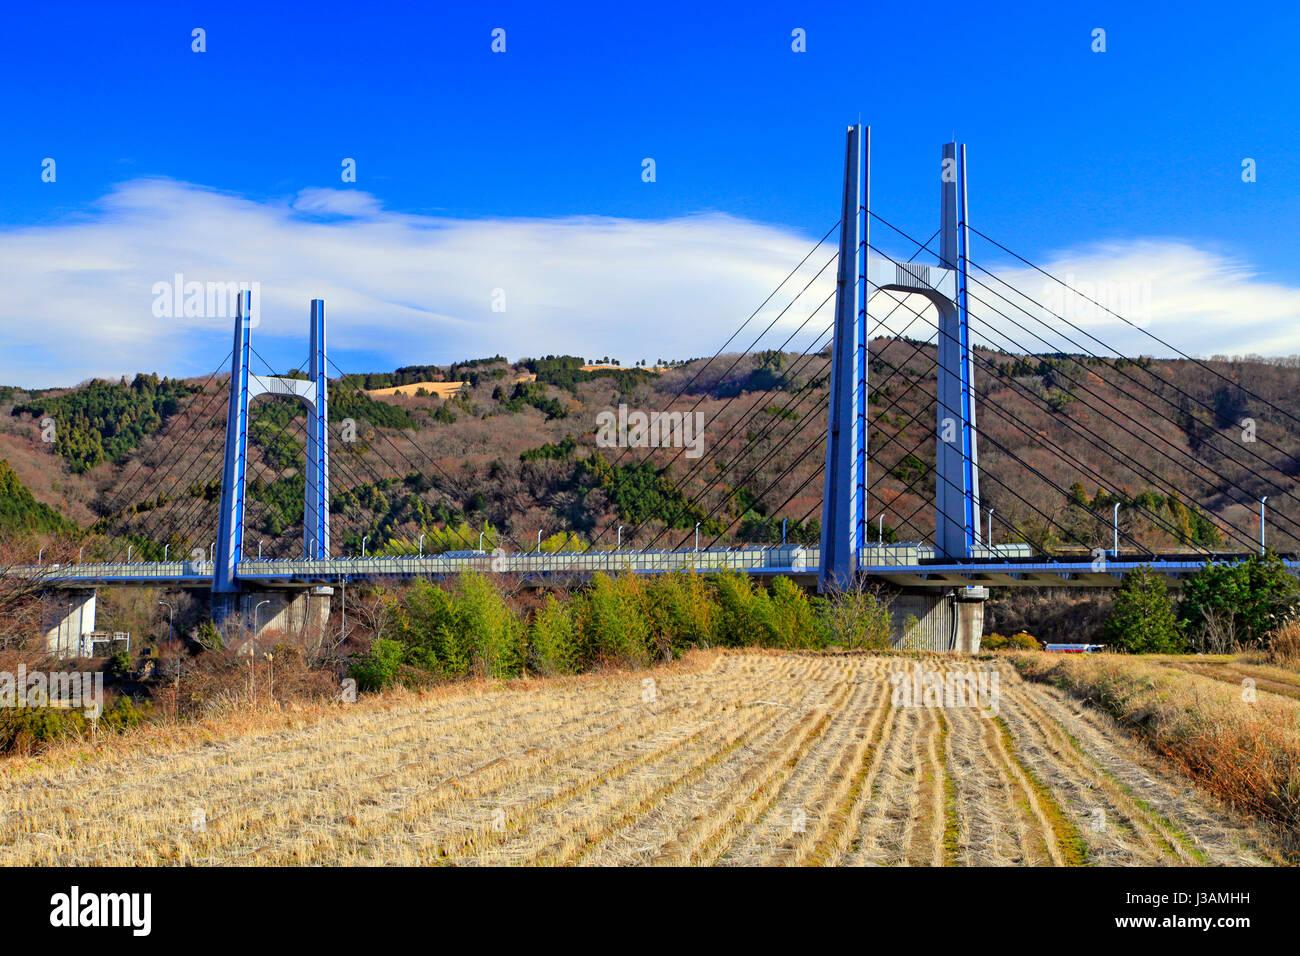 Tomei-Ashigarabashi Bridge on Tomei Expressway in Oyama-cho Shizuoka Japan - Stock Image